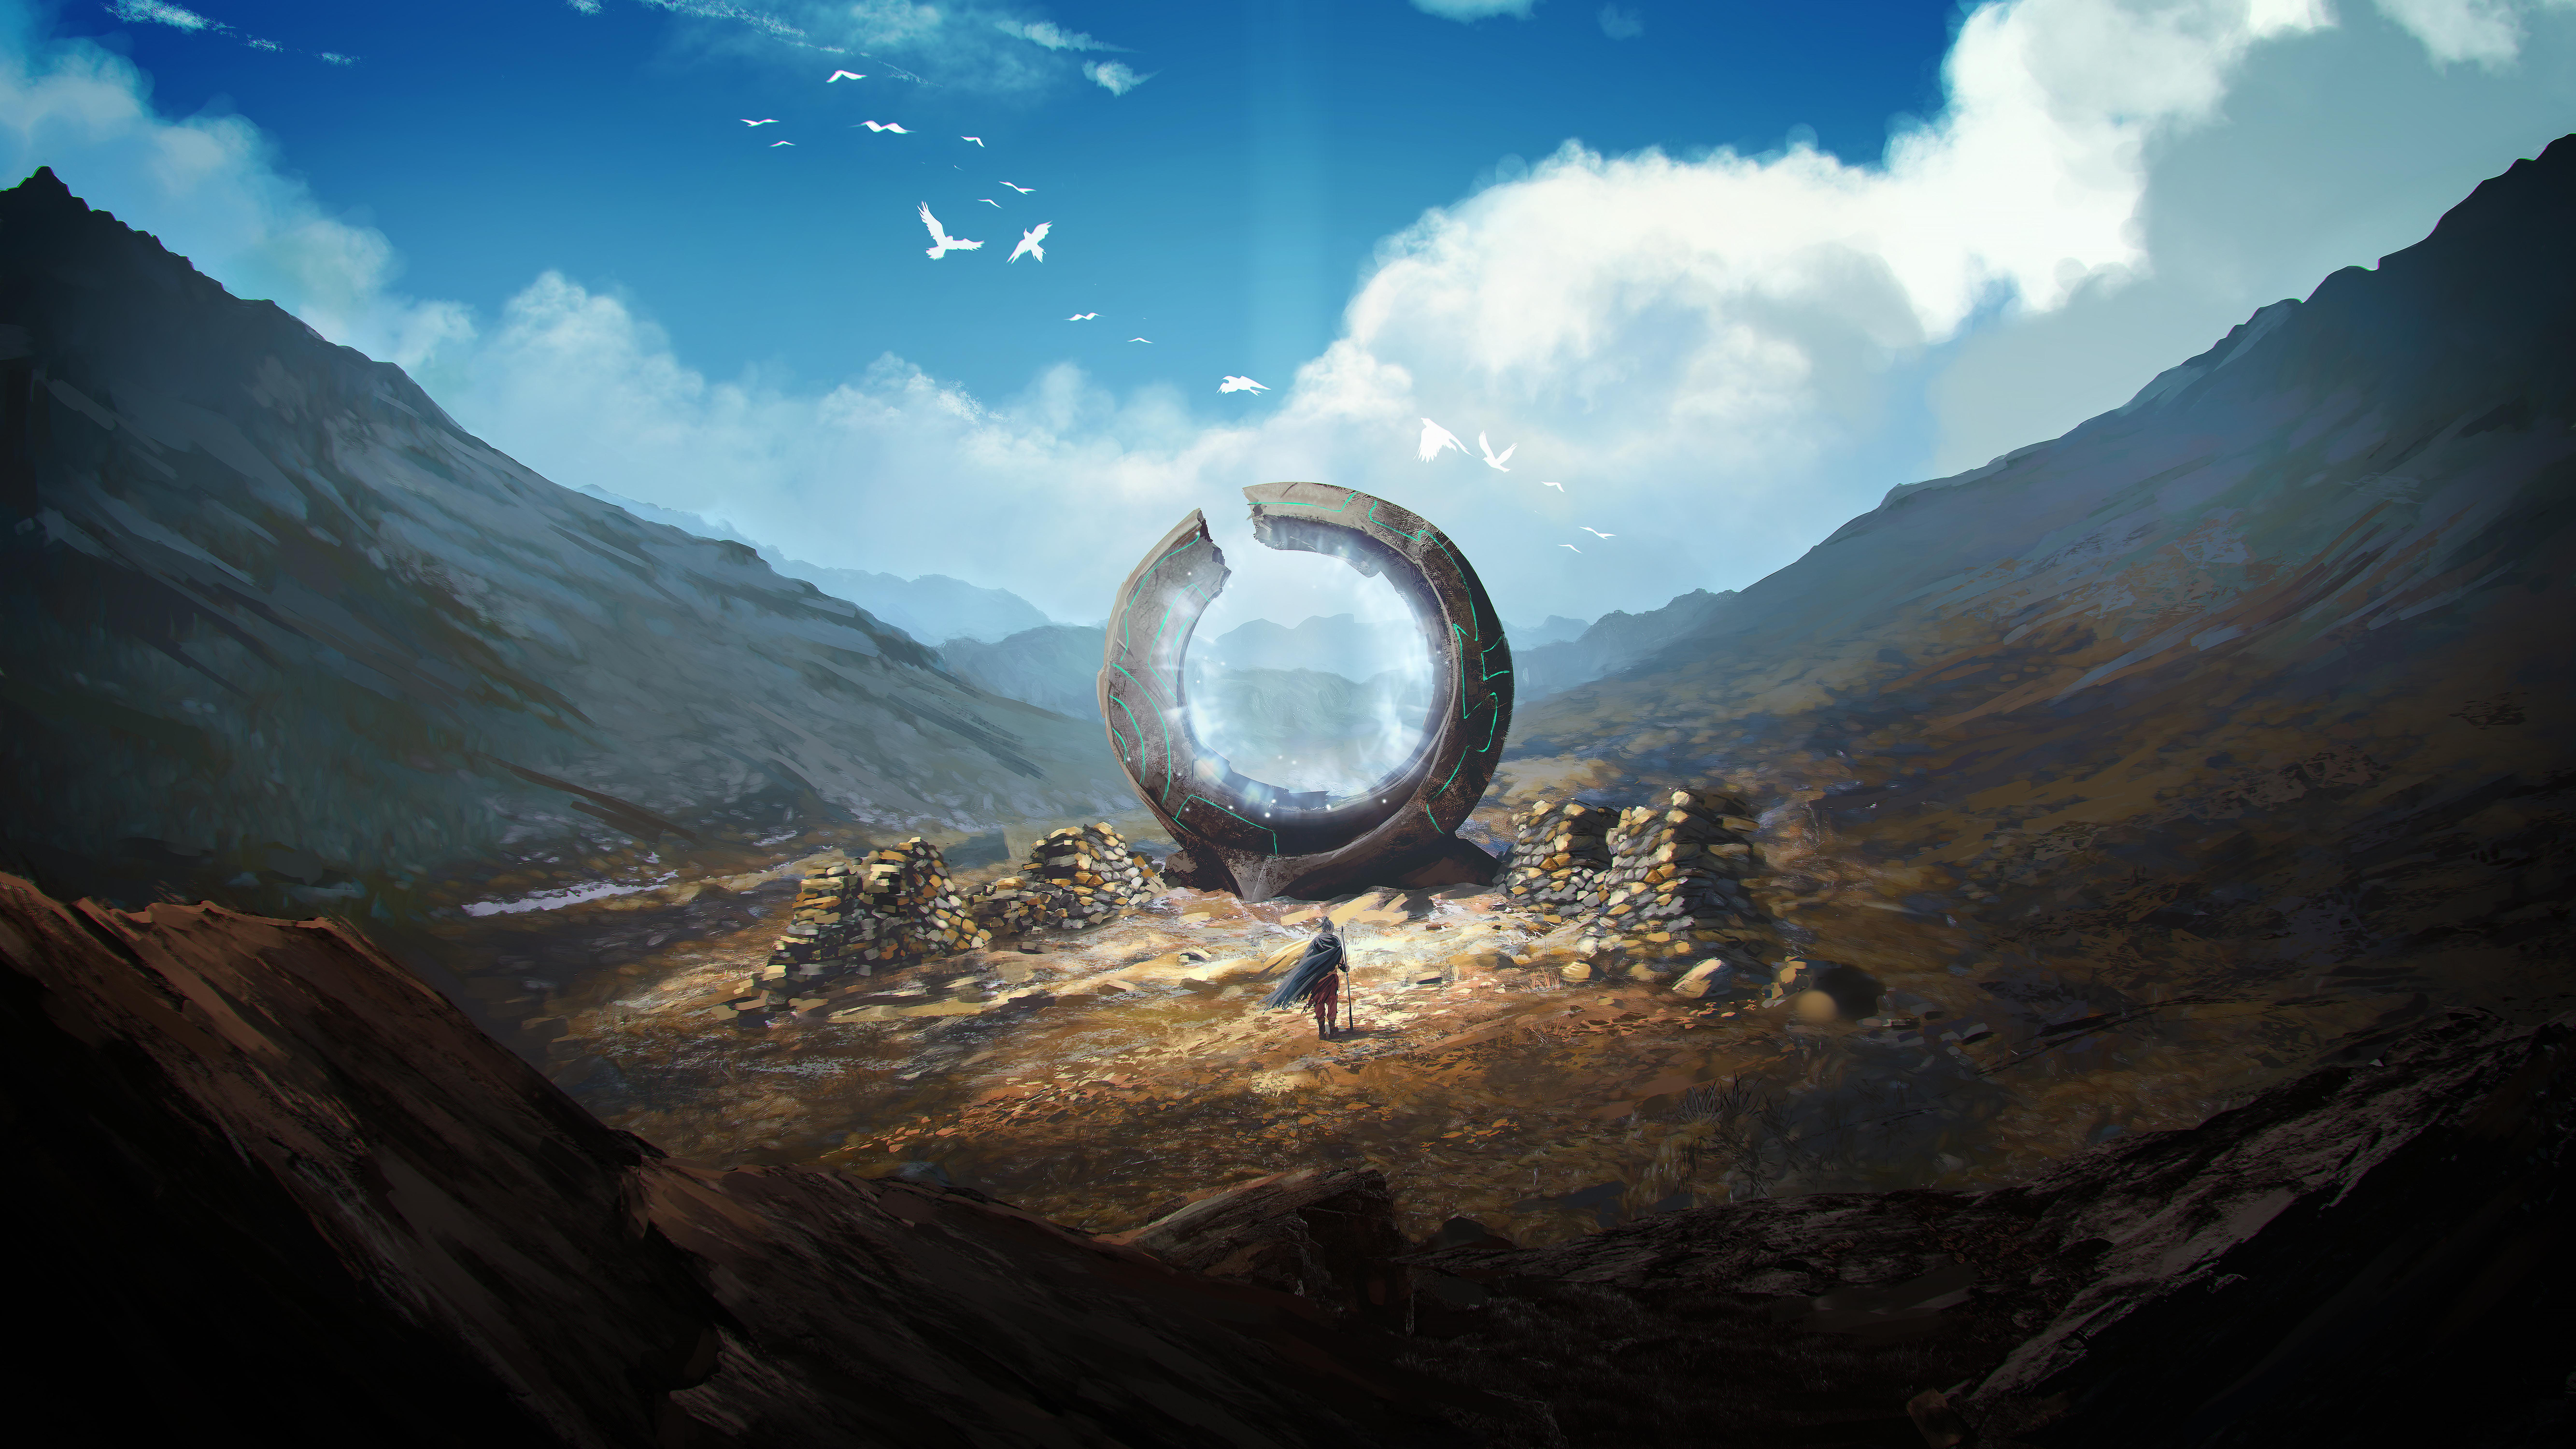 General 10667x6000 digital art mountains traveller environment rock Portal  4K